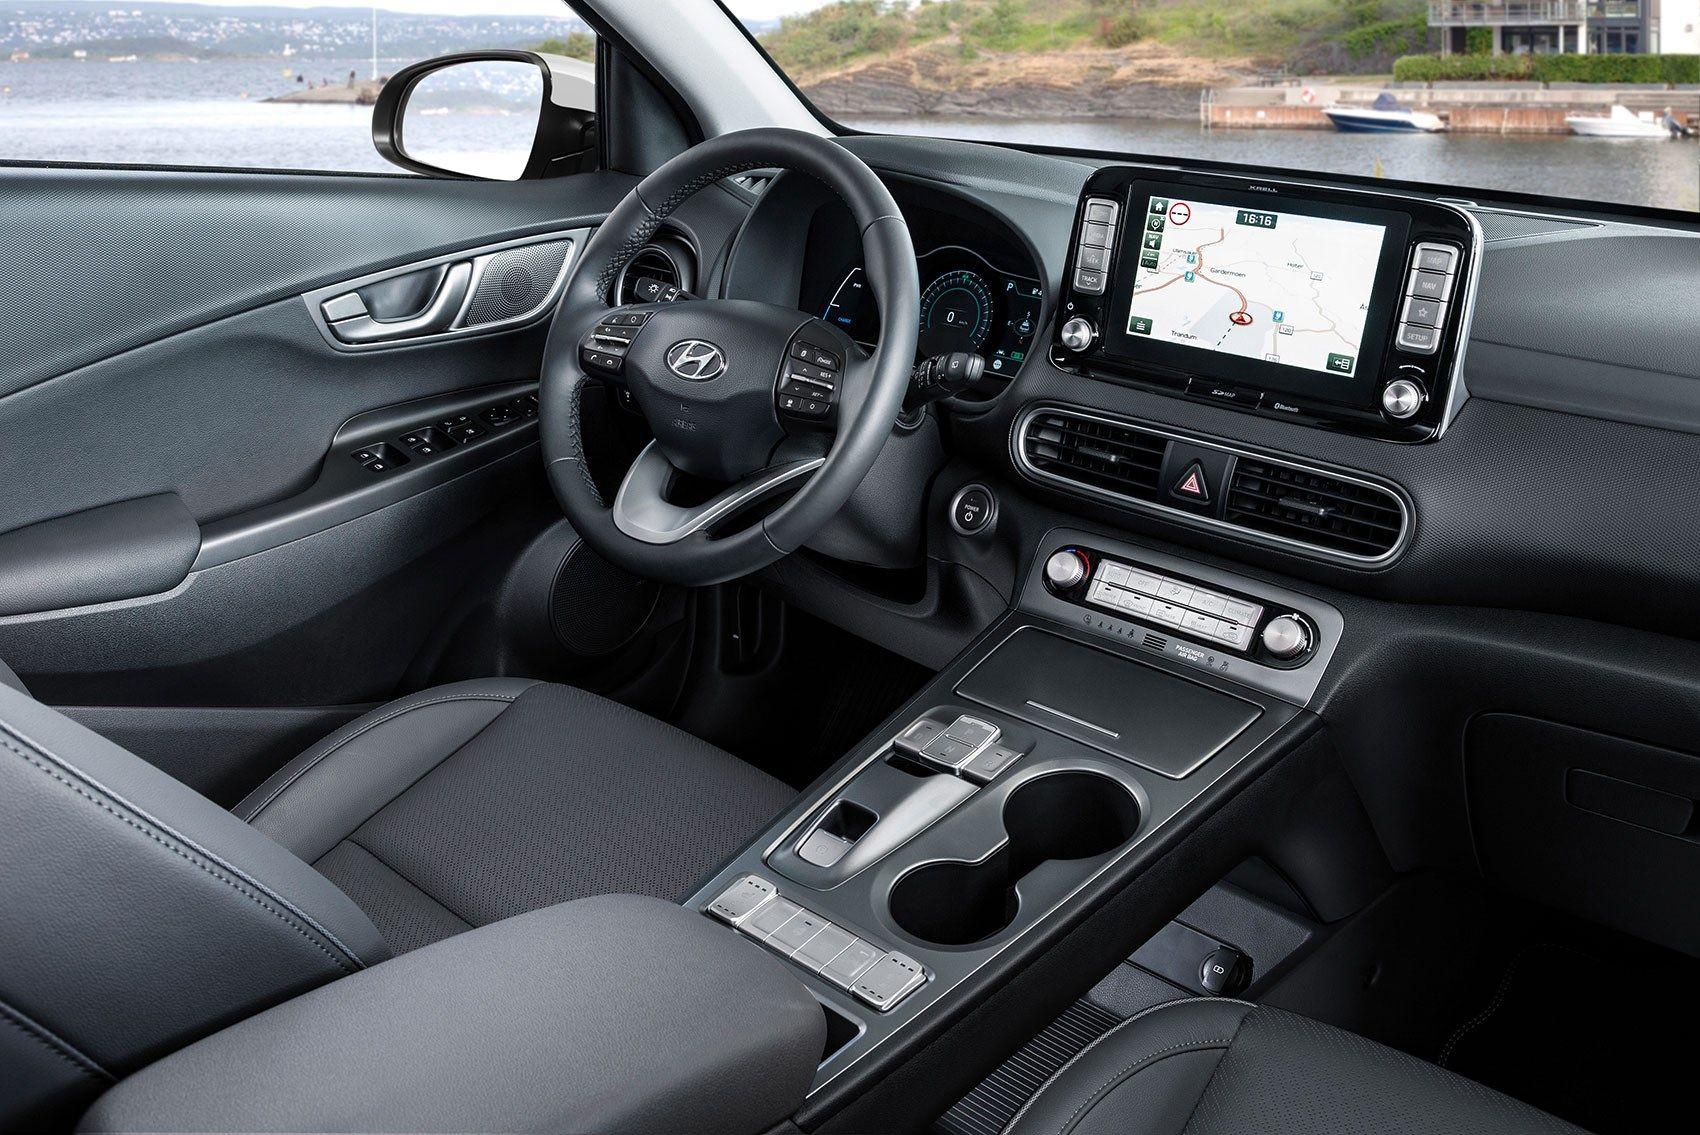 36+ Hyundai kona electric interior inspirations